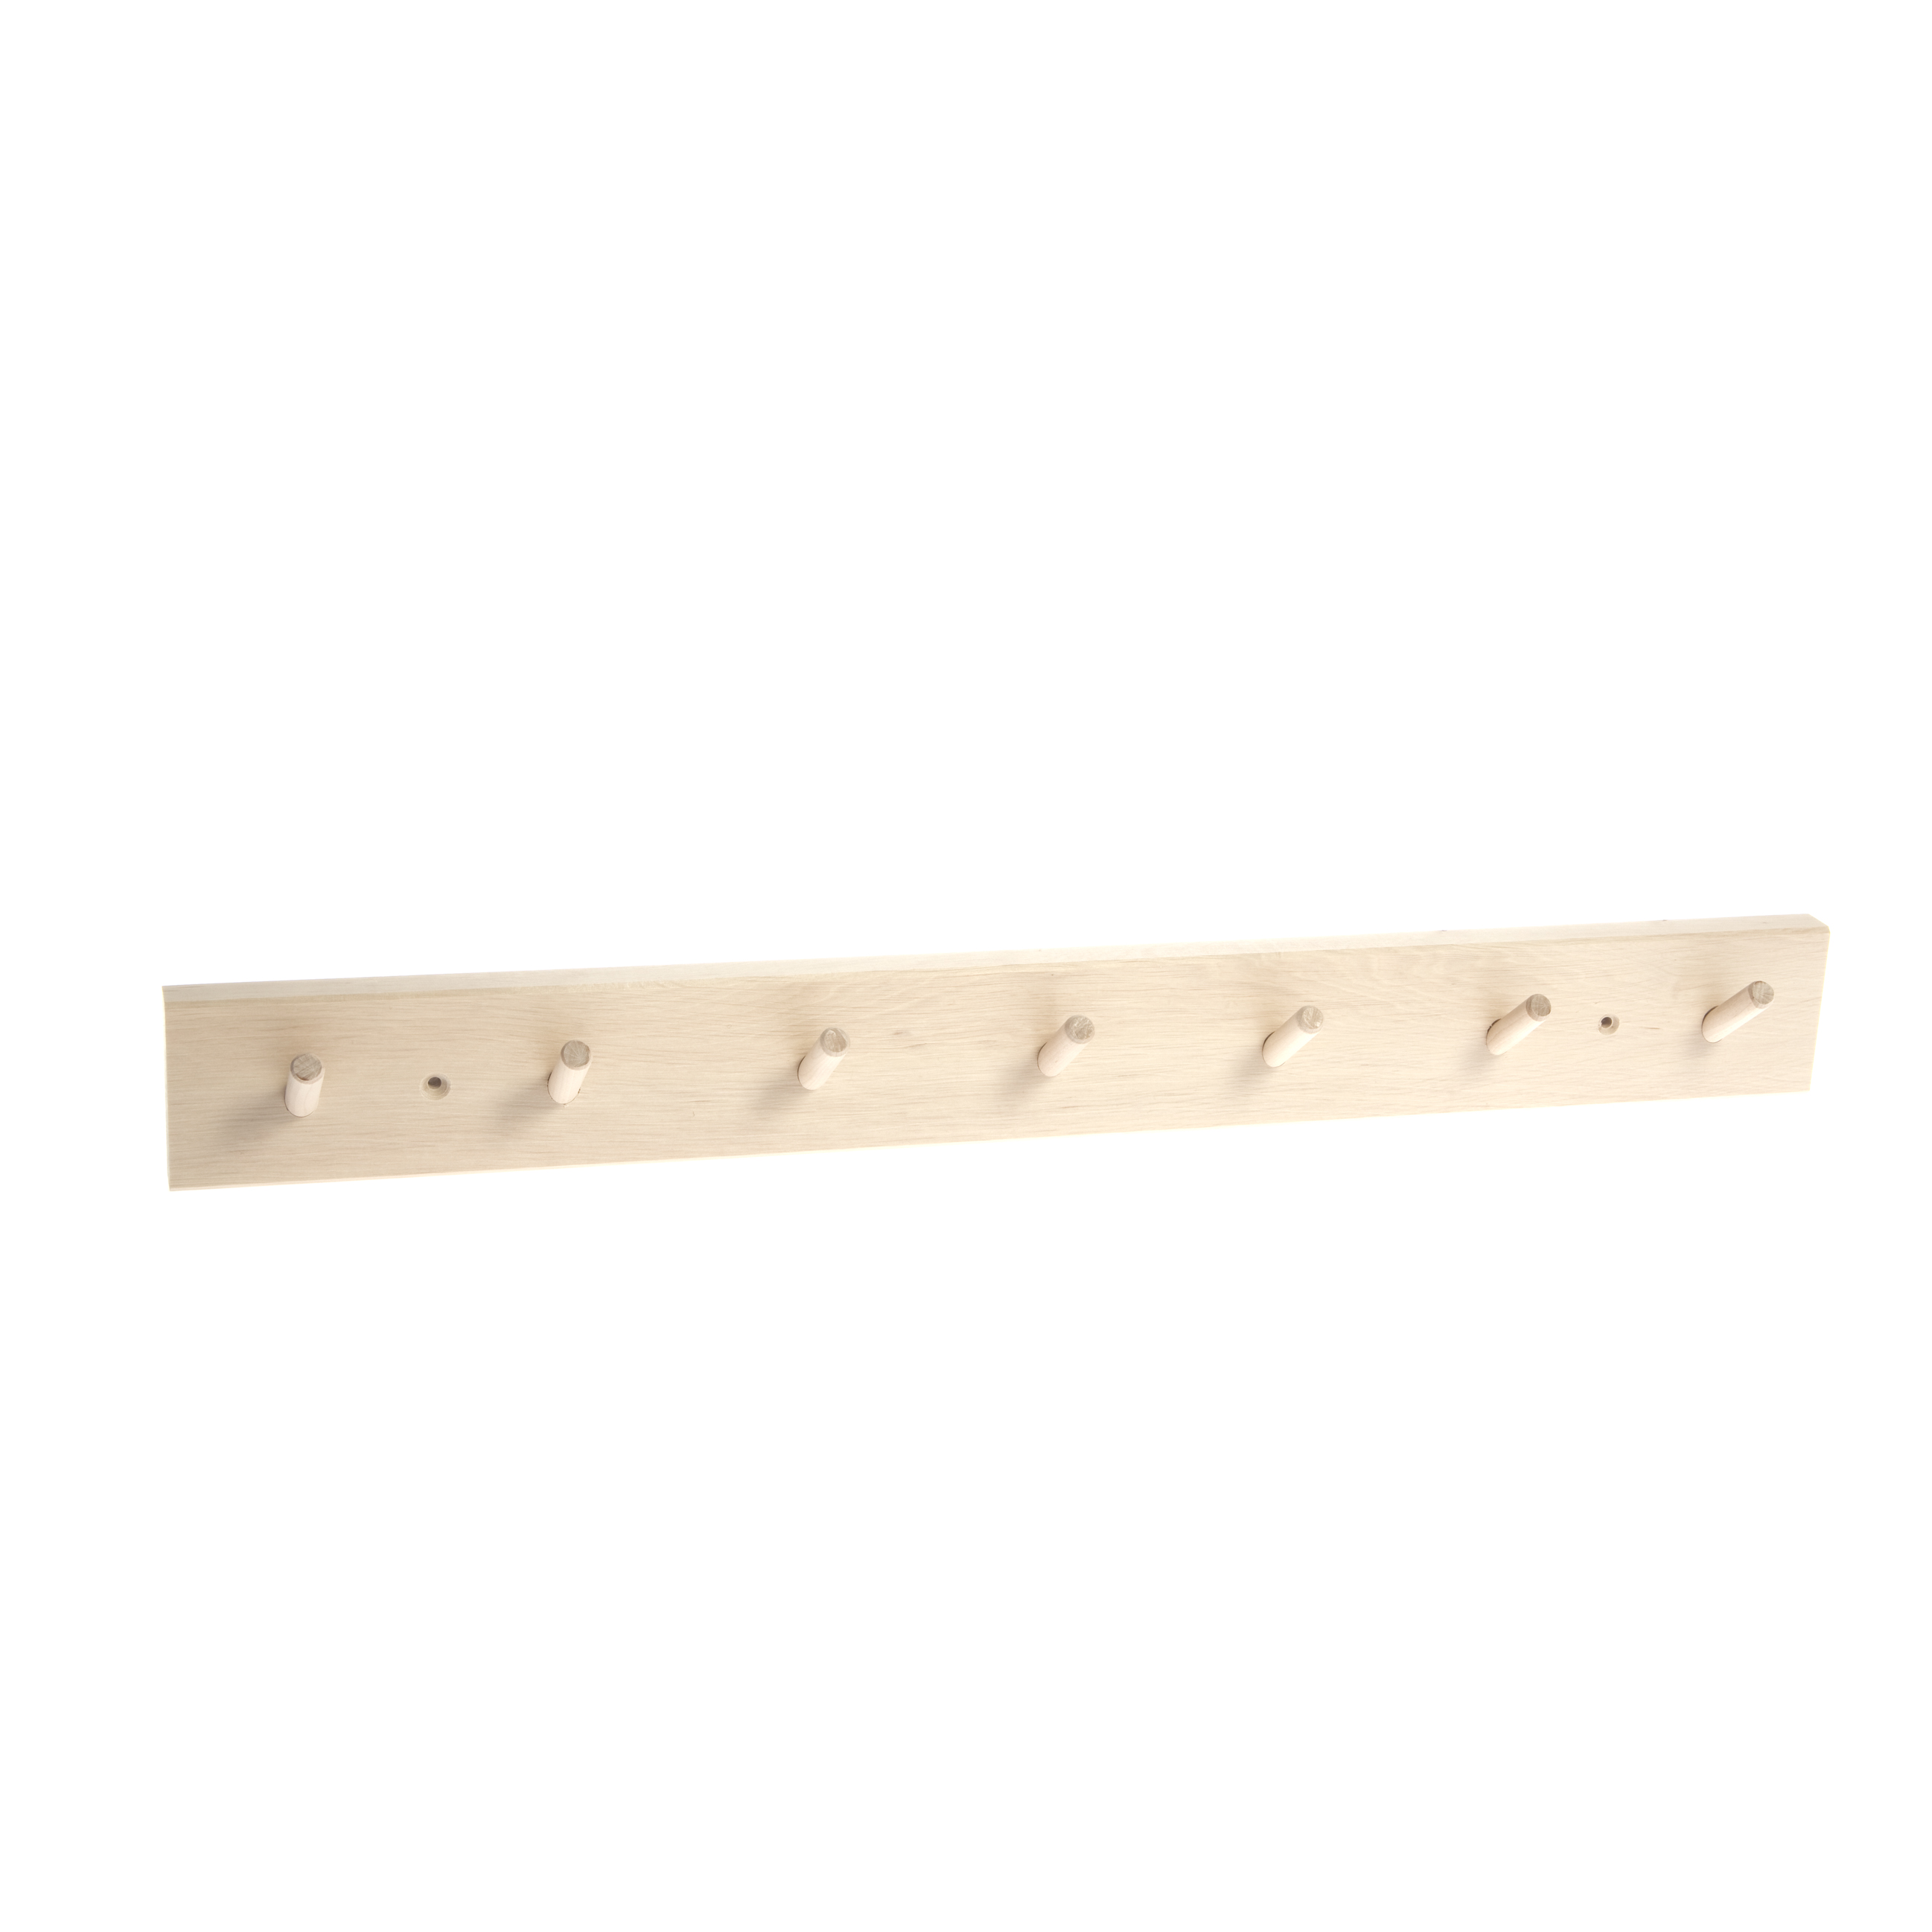 Iris Hantverk Wooden Peg Rack 7 Hooks